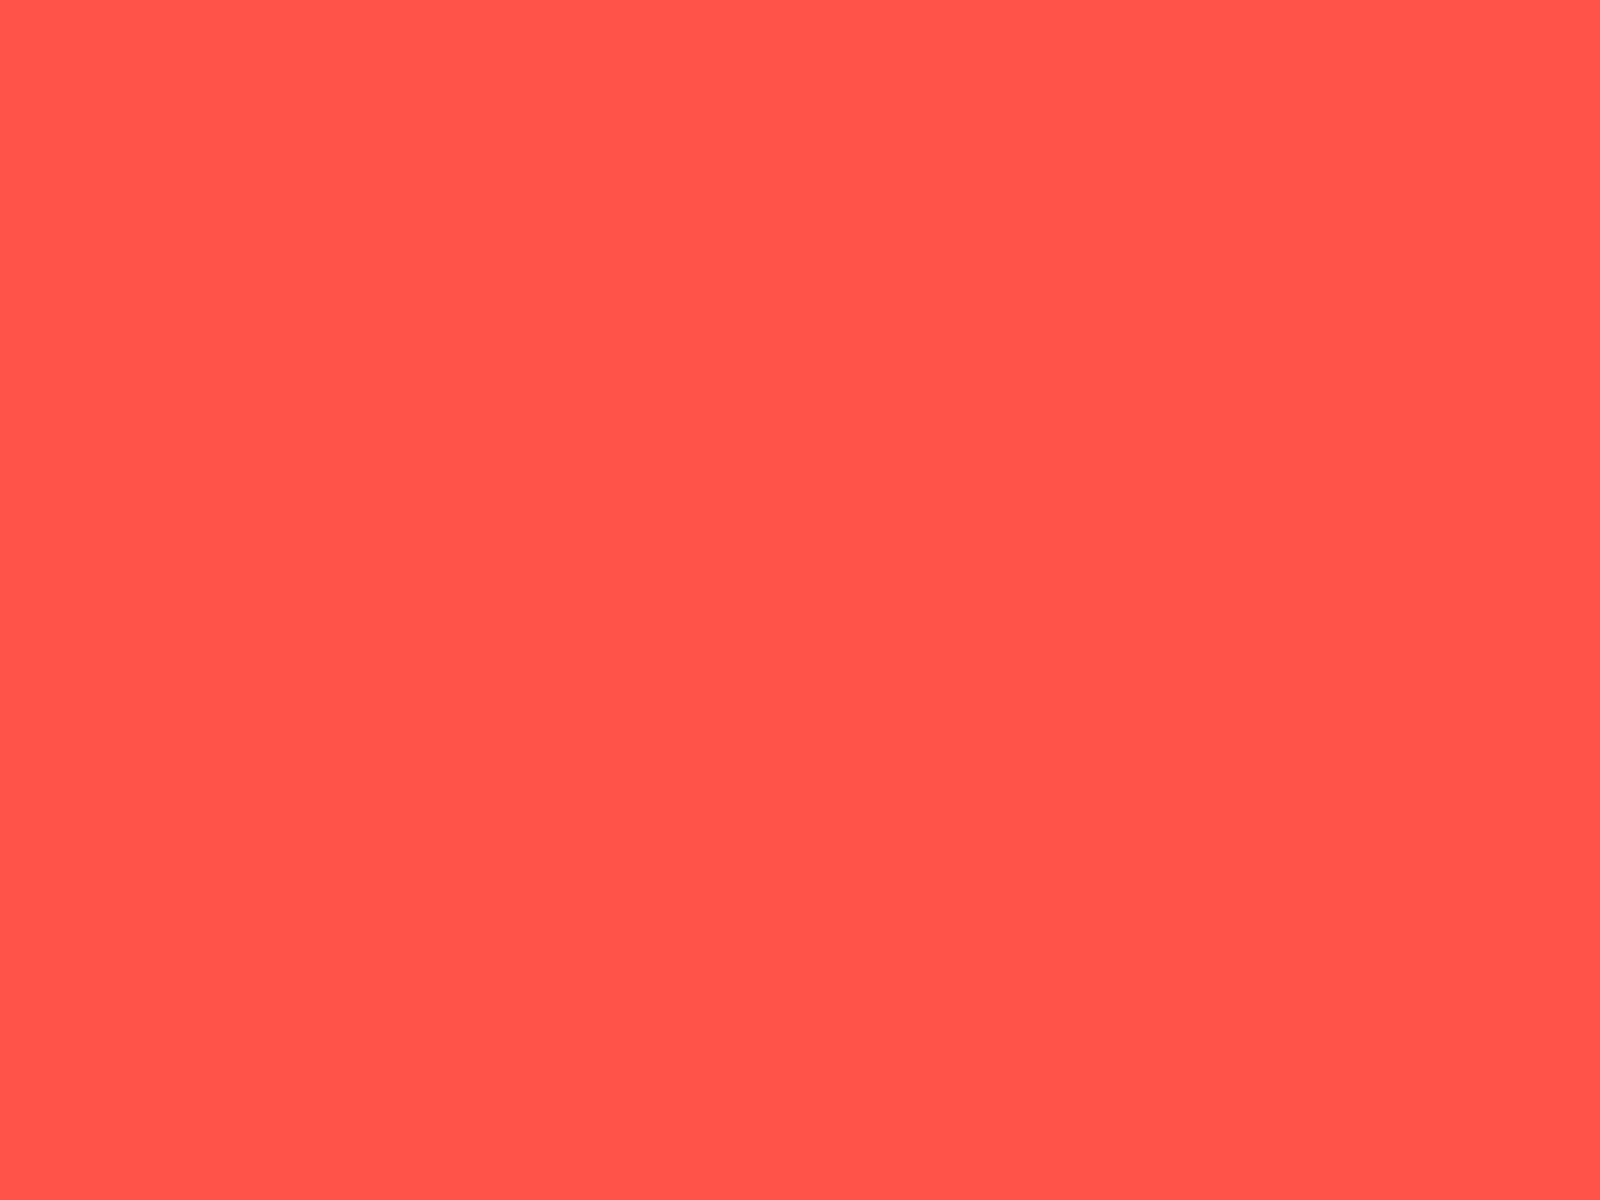 1600x1200 Red-orange Solid Color Background